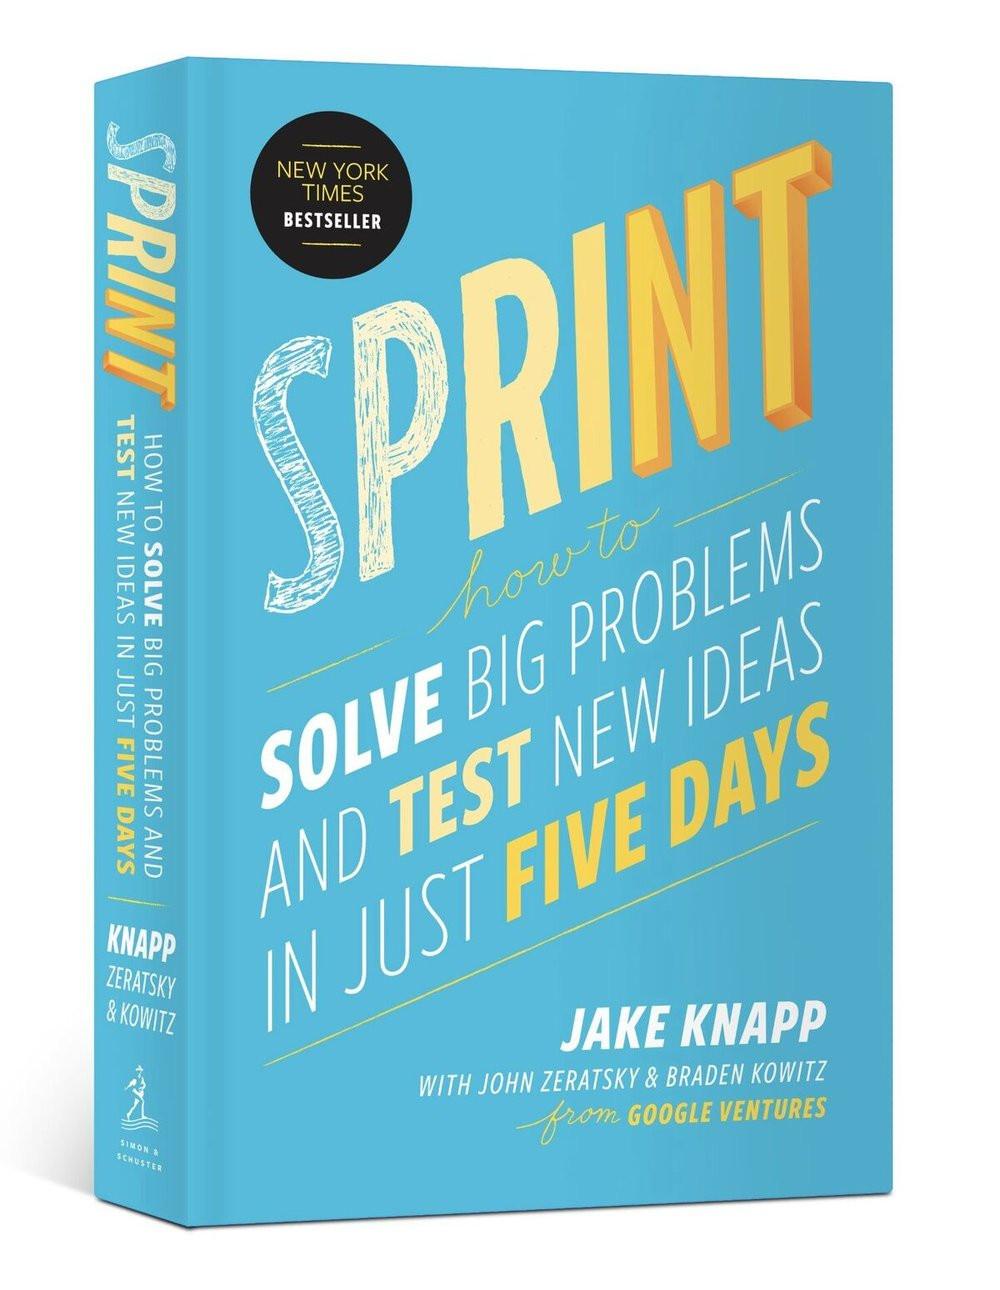 Sprint design book